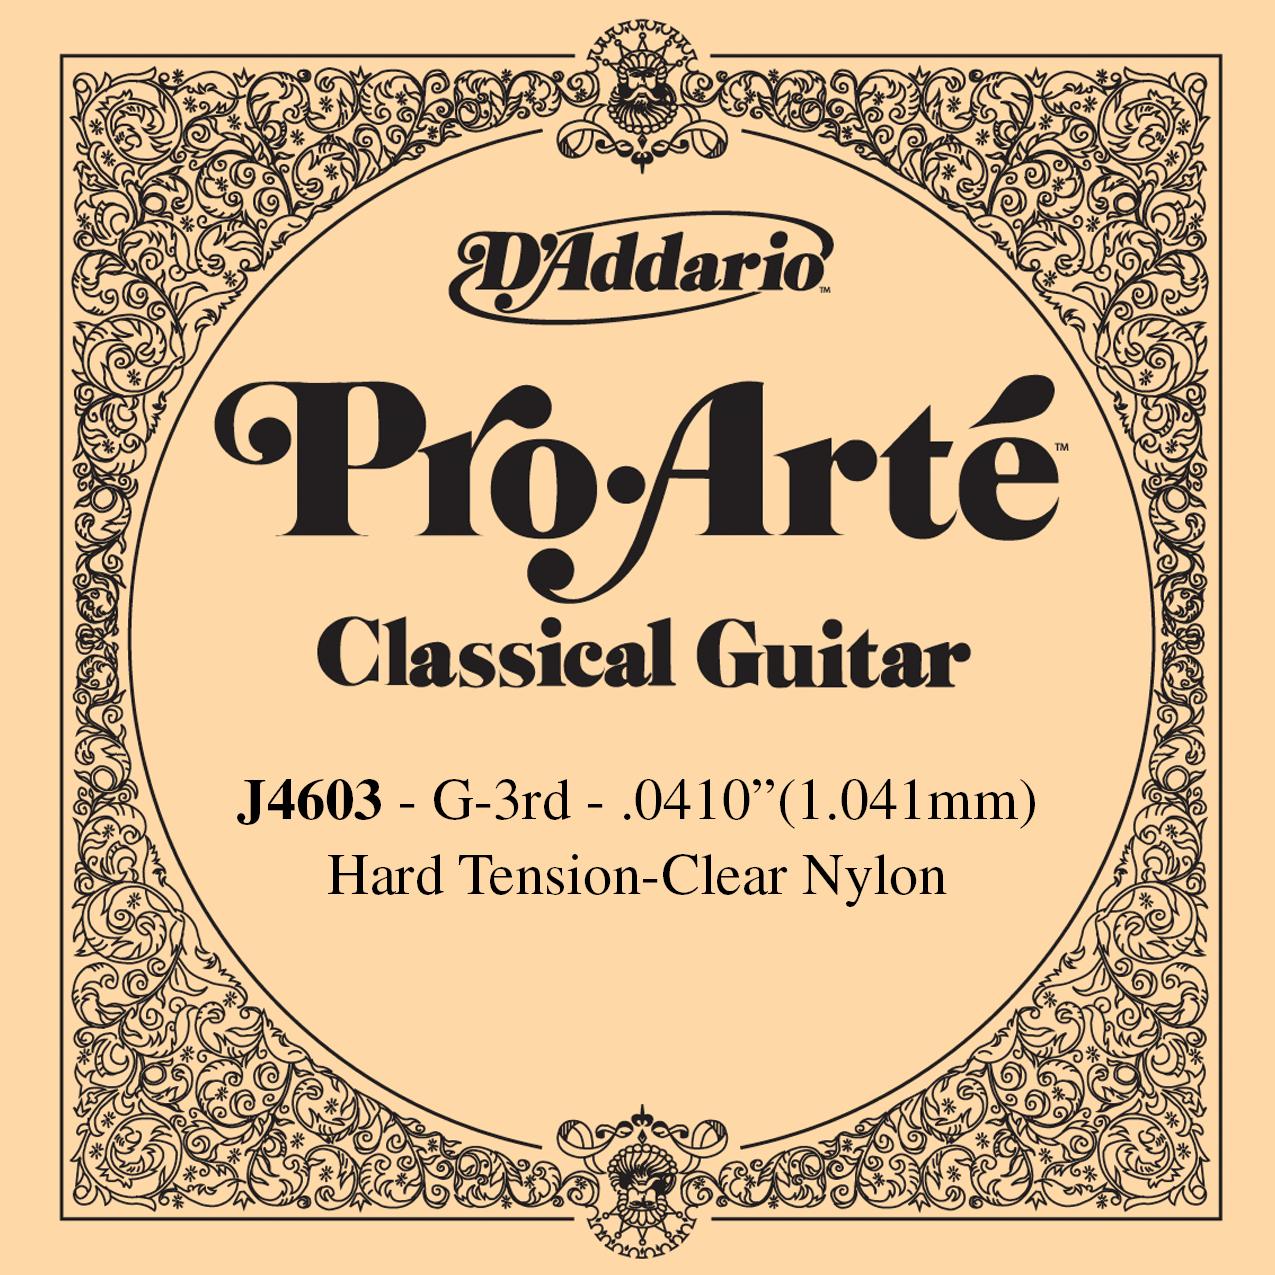 D'Addario J4603 Pro-Arte Nylon Classical Guitar Single String, Hard Tension, 3rd String G